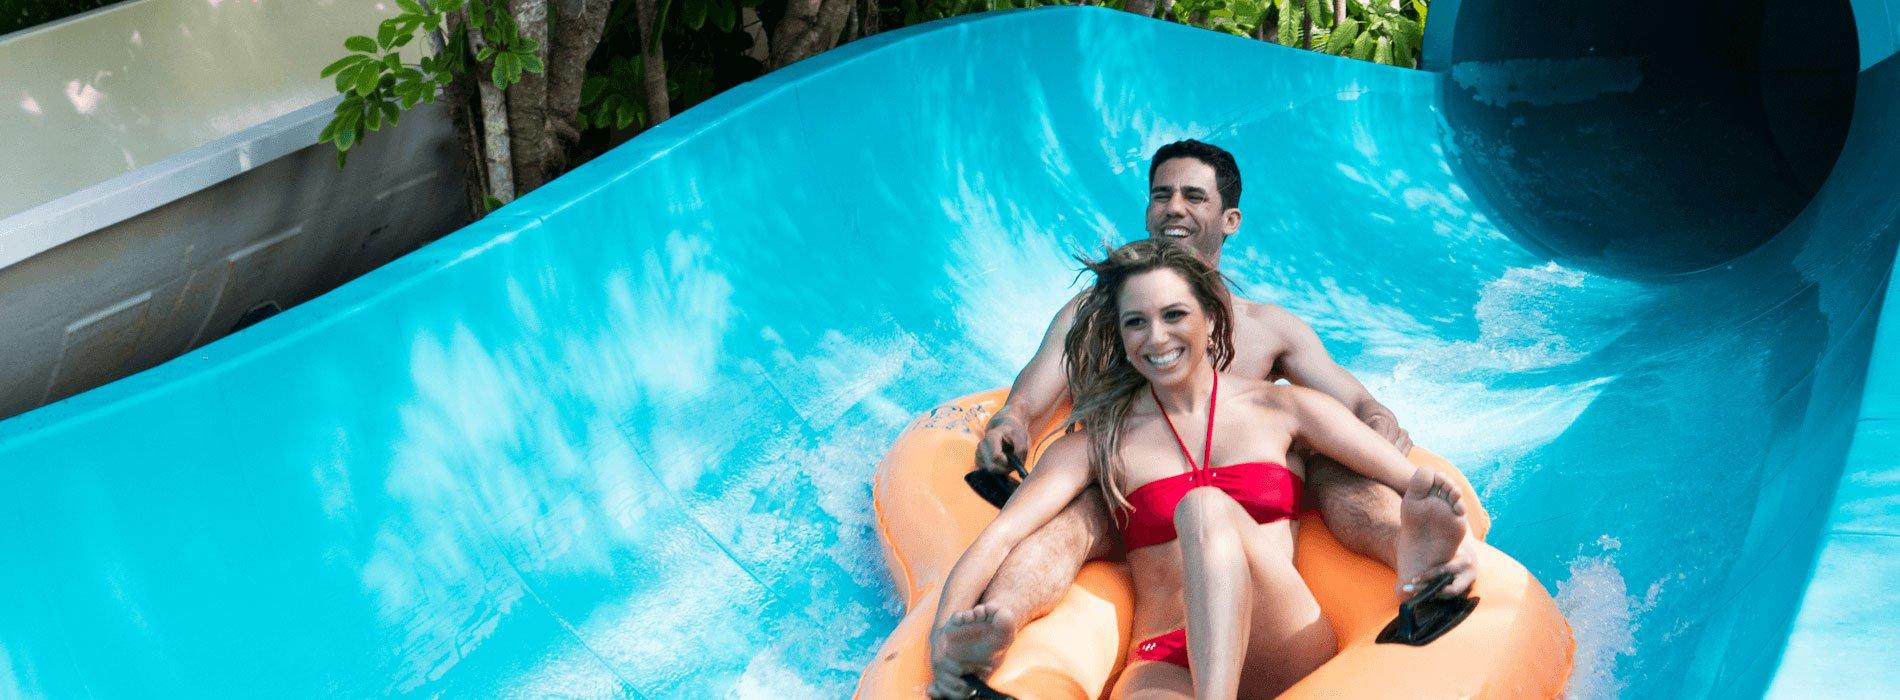 Calypso Coaster Water Slide at Adventure Island